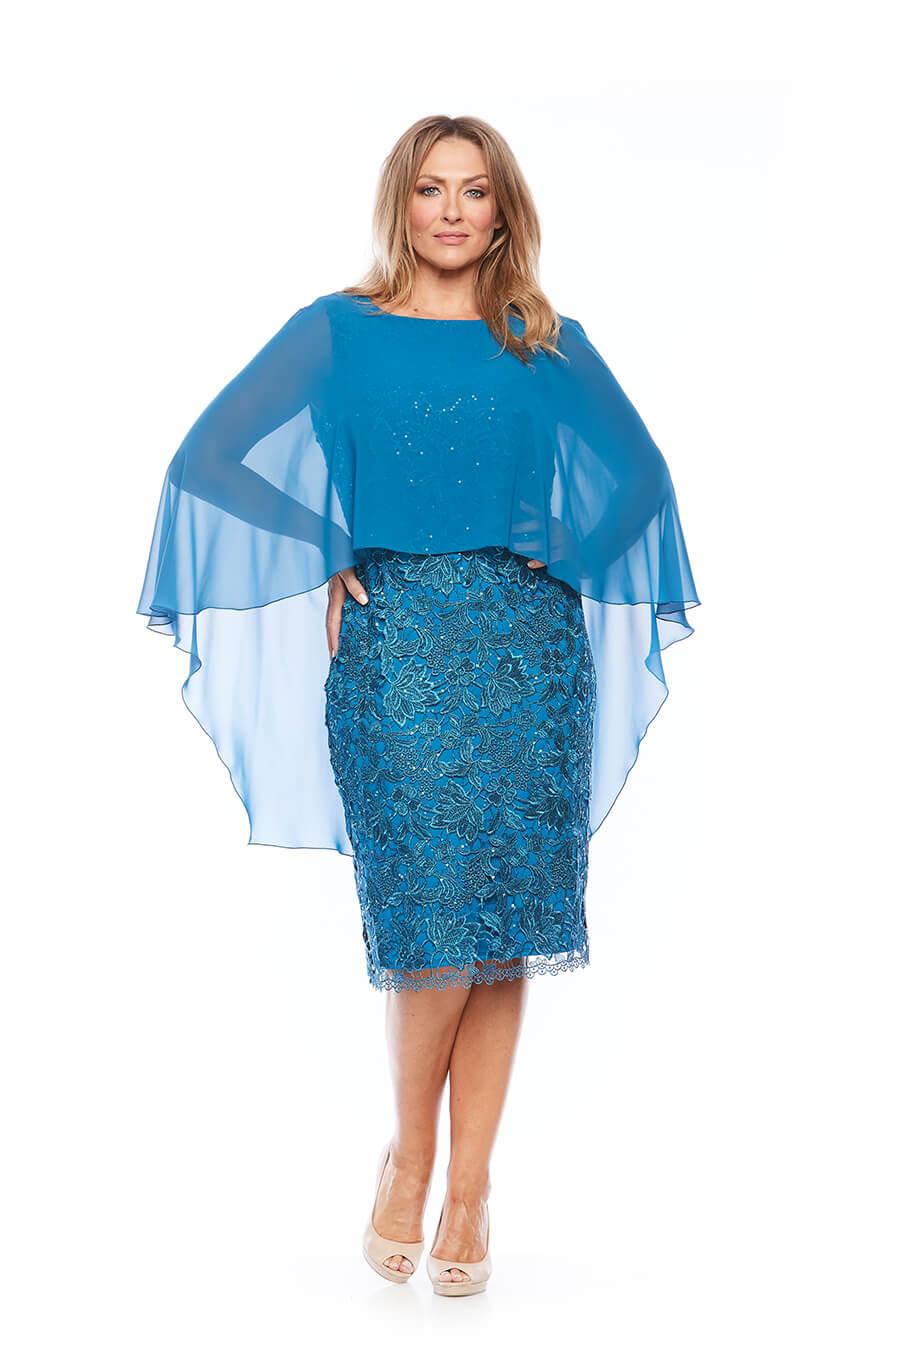 Layla Jones Dress, PLUS SIZE MOTHER OF THE BRIDE DRESS